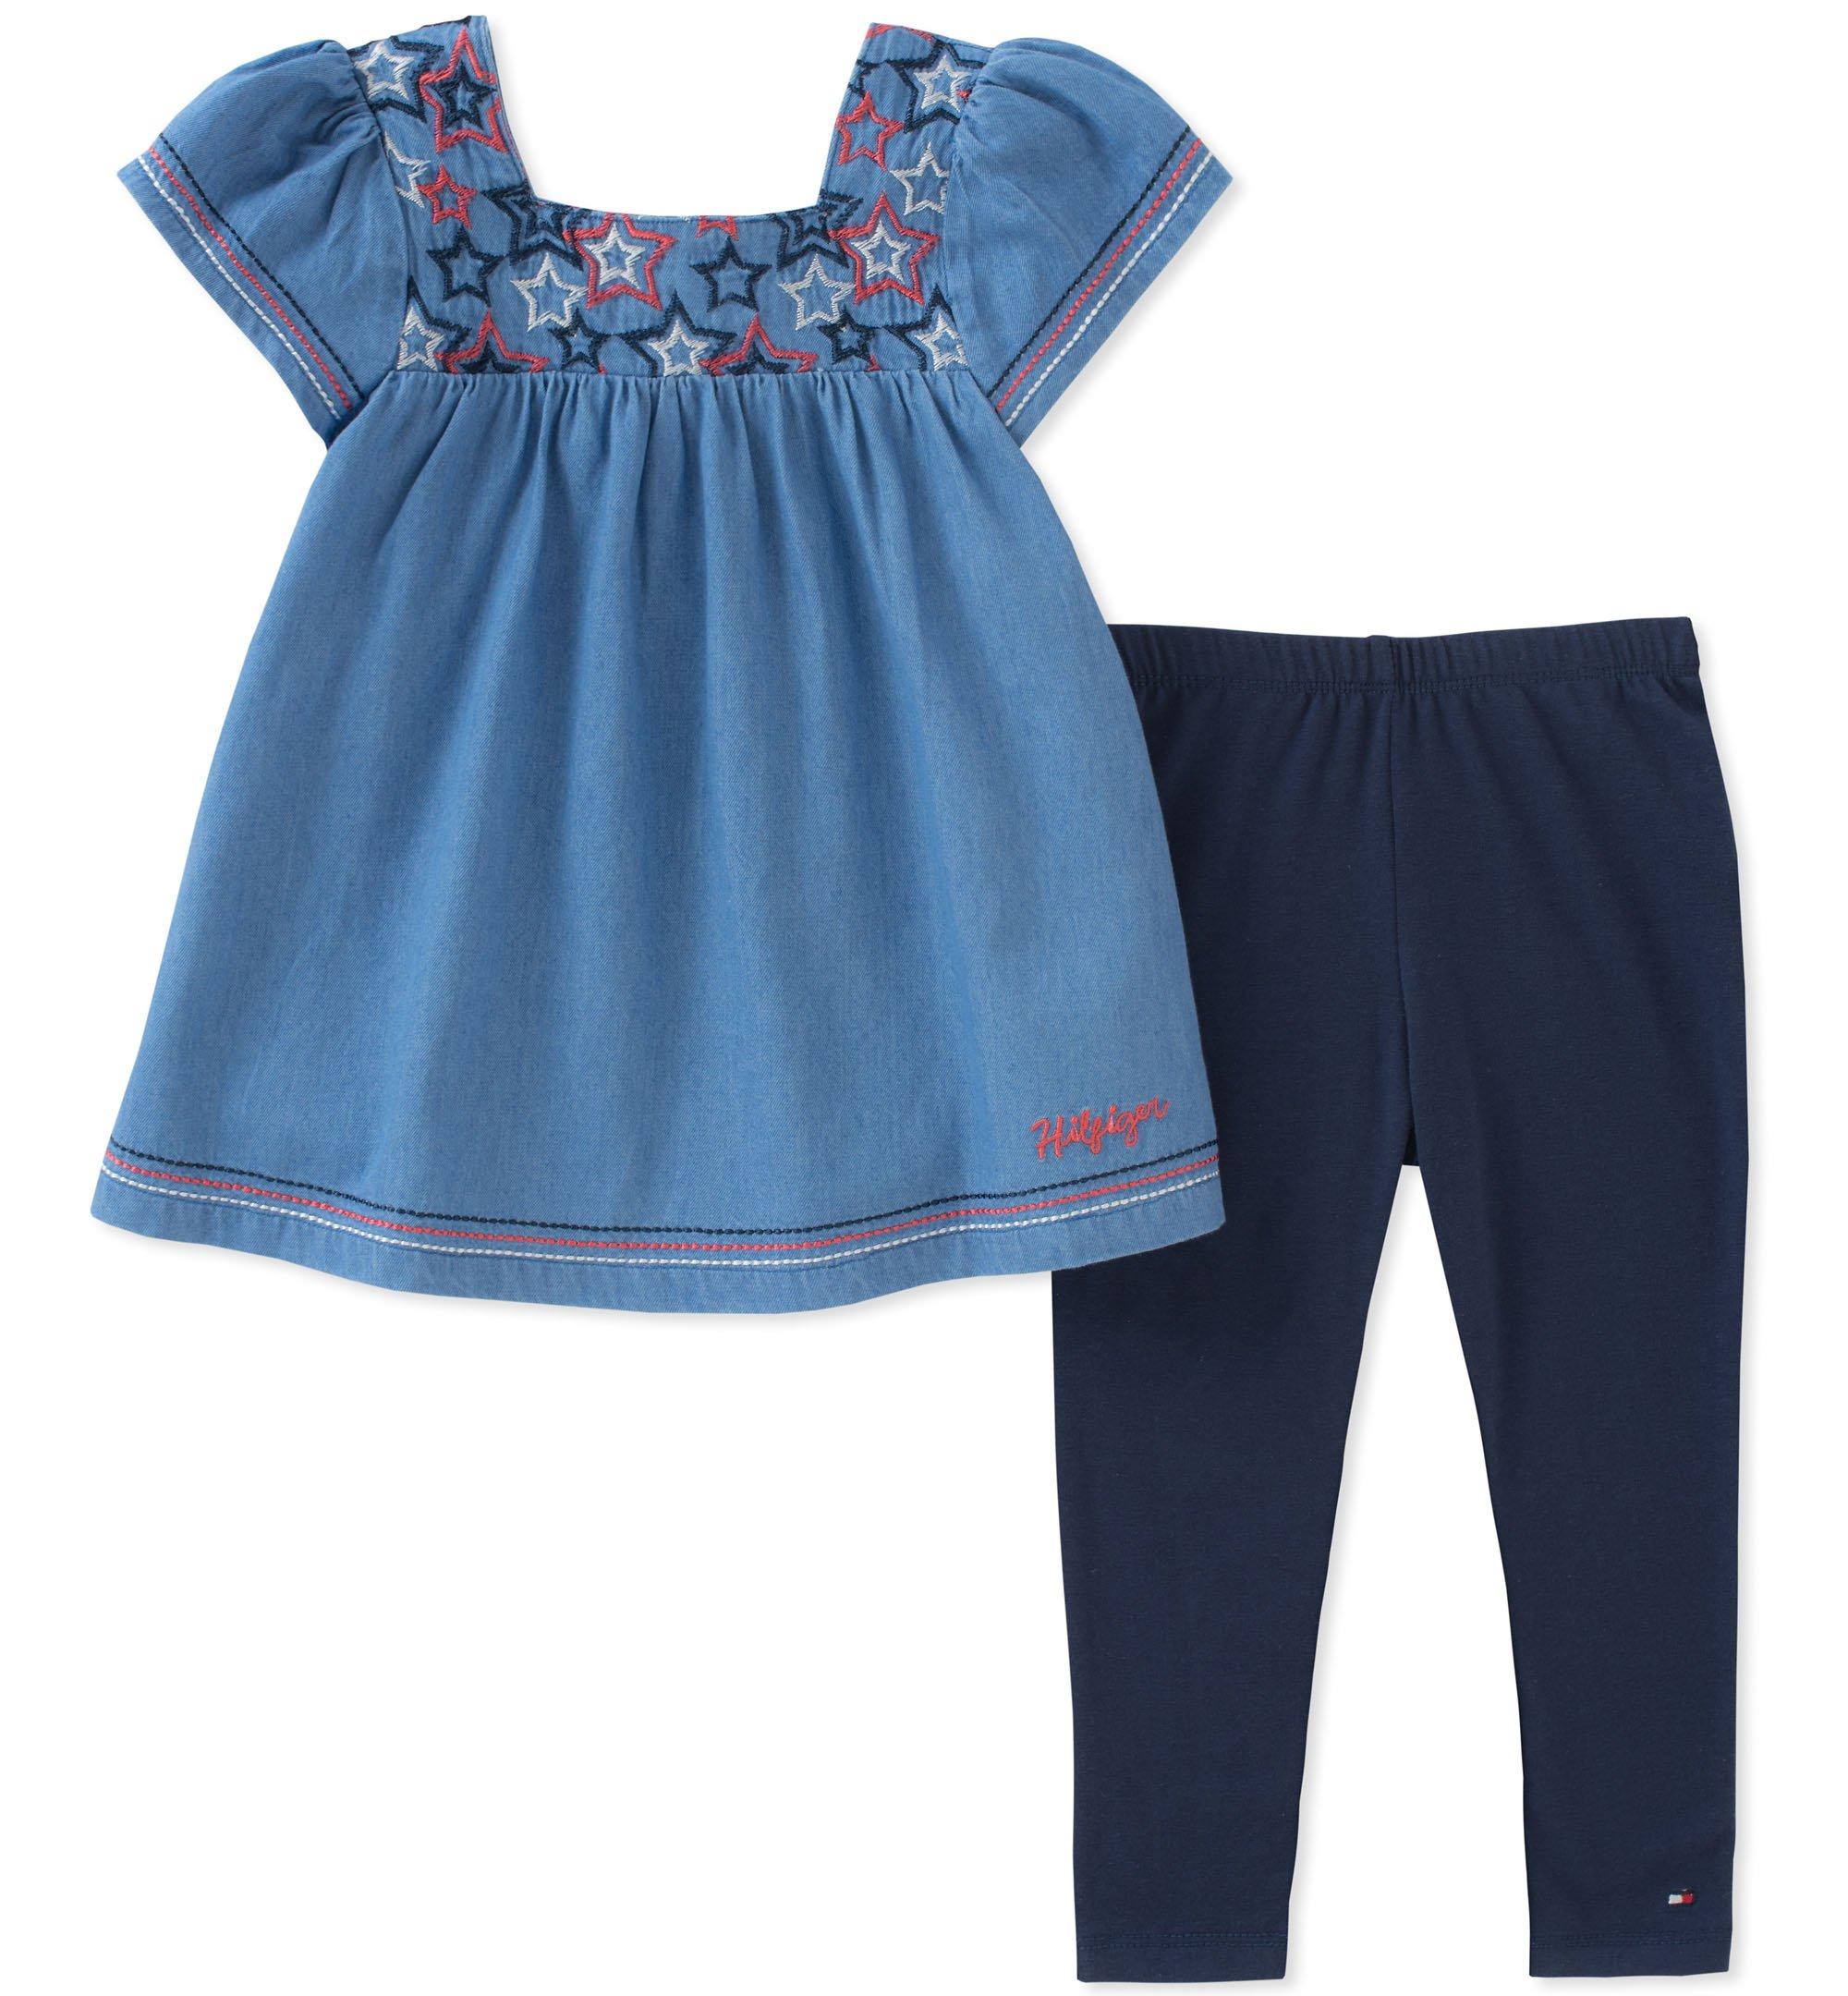 Tommy Hilfiger Toddler Girls' Tunic Set, Twinkle Blue/Navy, 3T